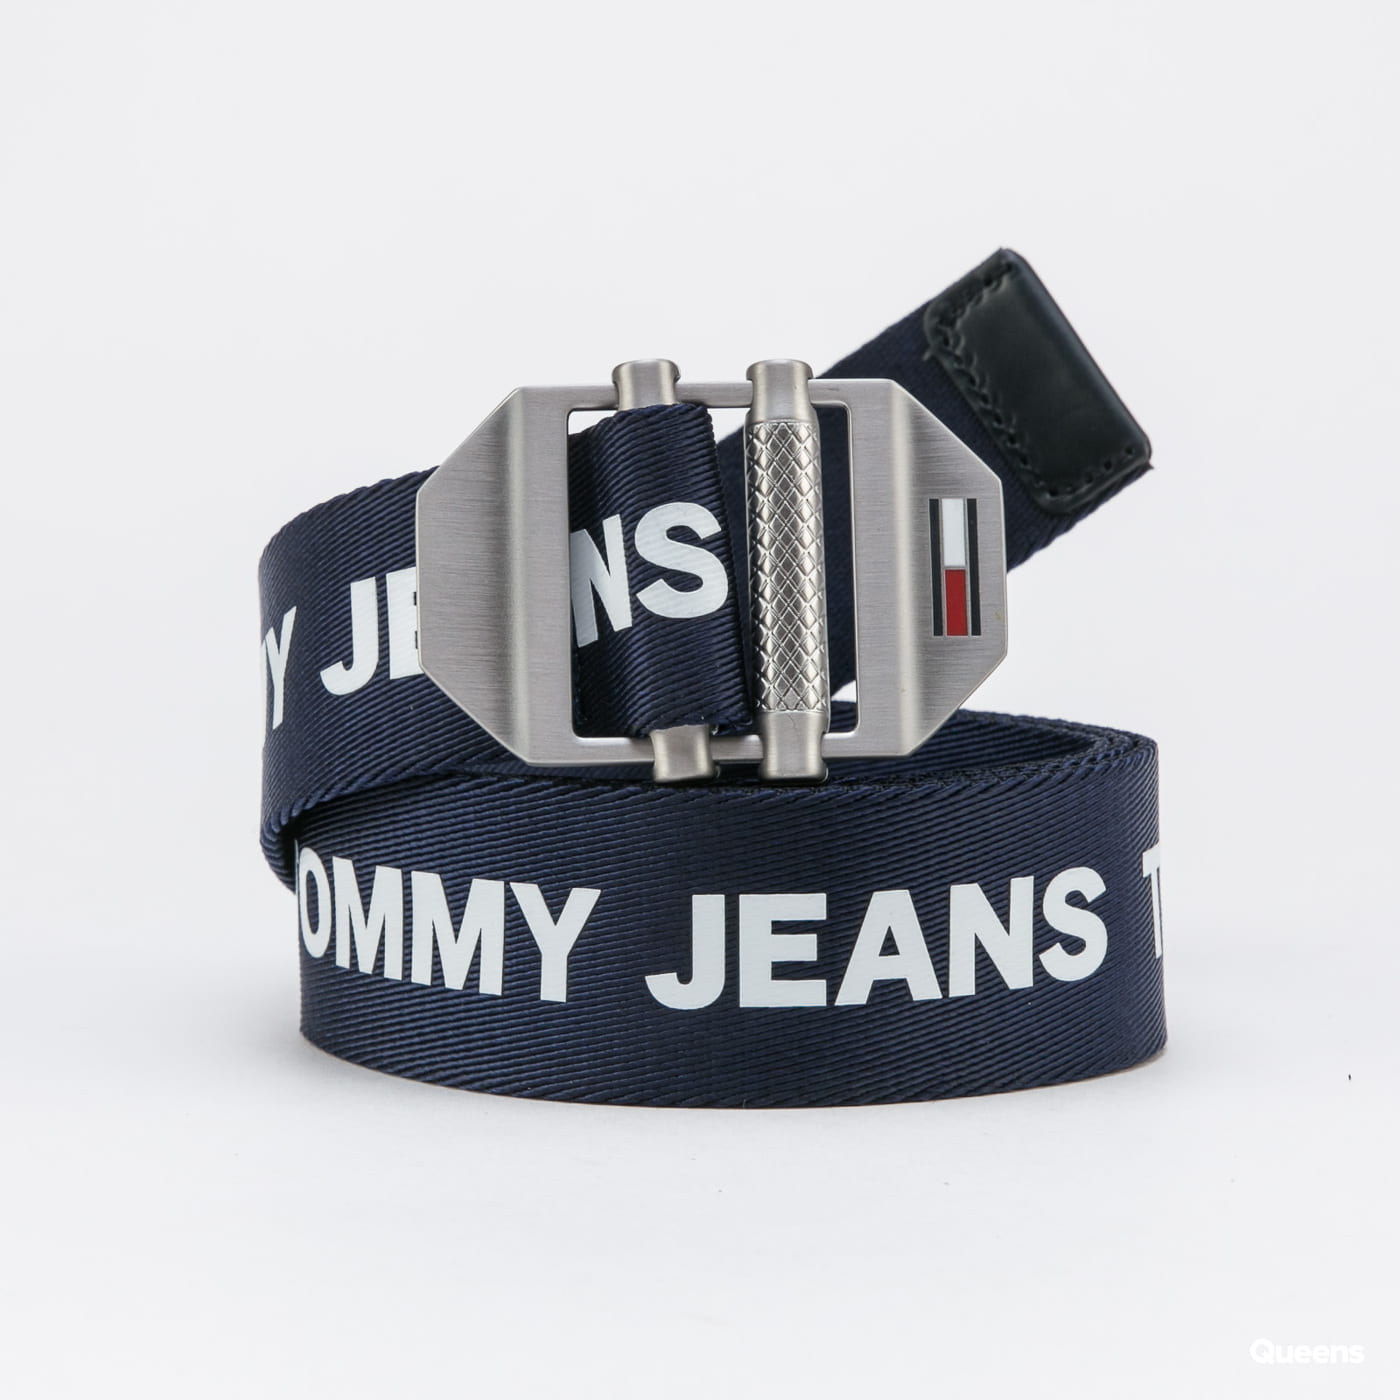 TOMMY JEANS Double Roller Bckle 3.5 Belt